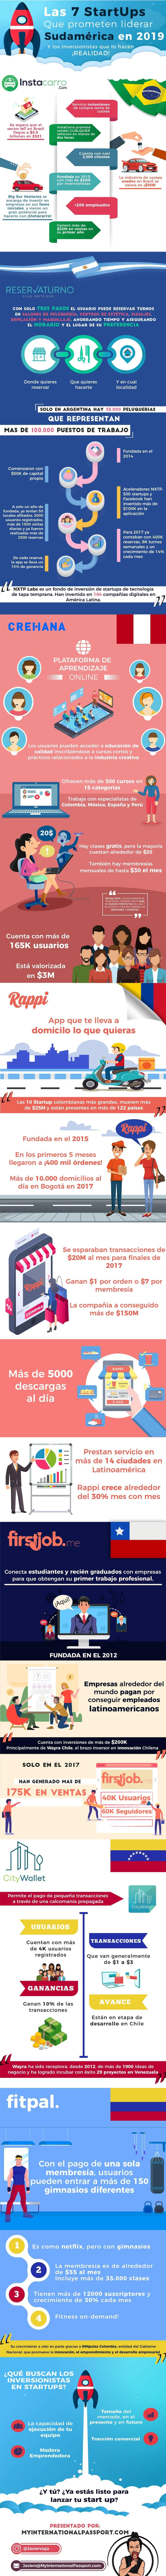 startups latinoamericanas